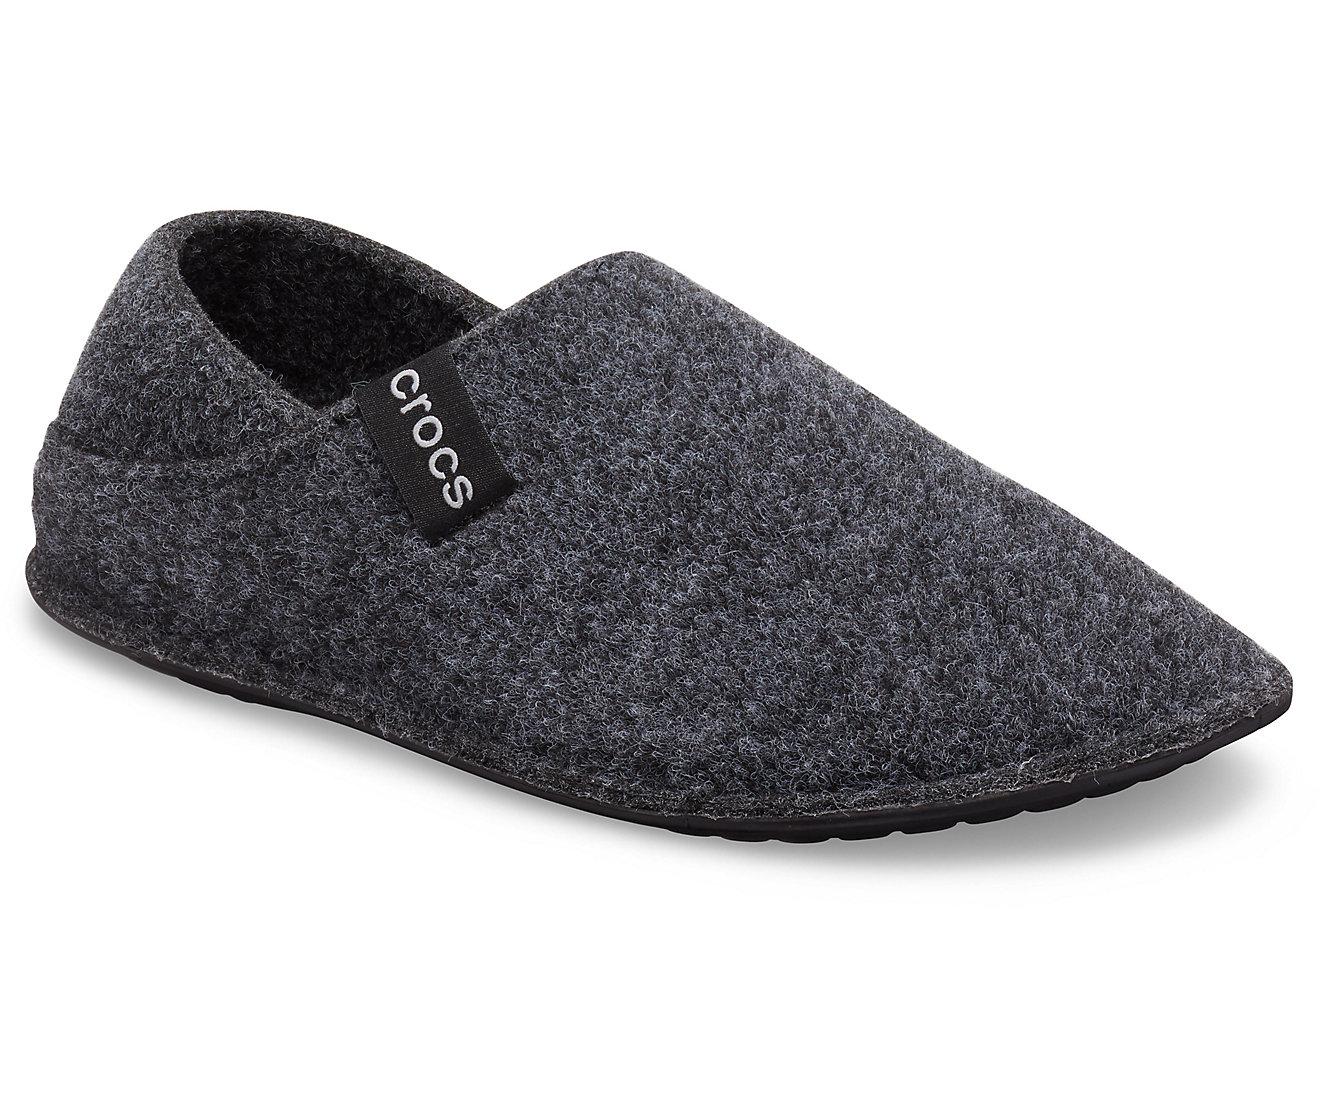 Crocs Classic Convertible Slipper 205837-060 BLACK/BLACK Μαύρο